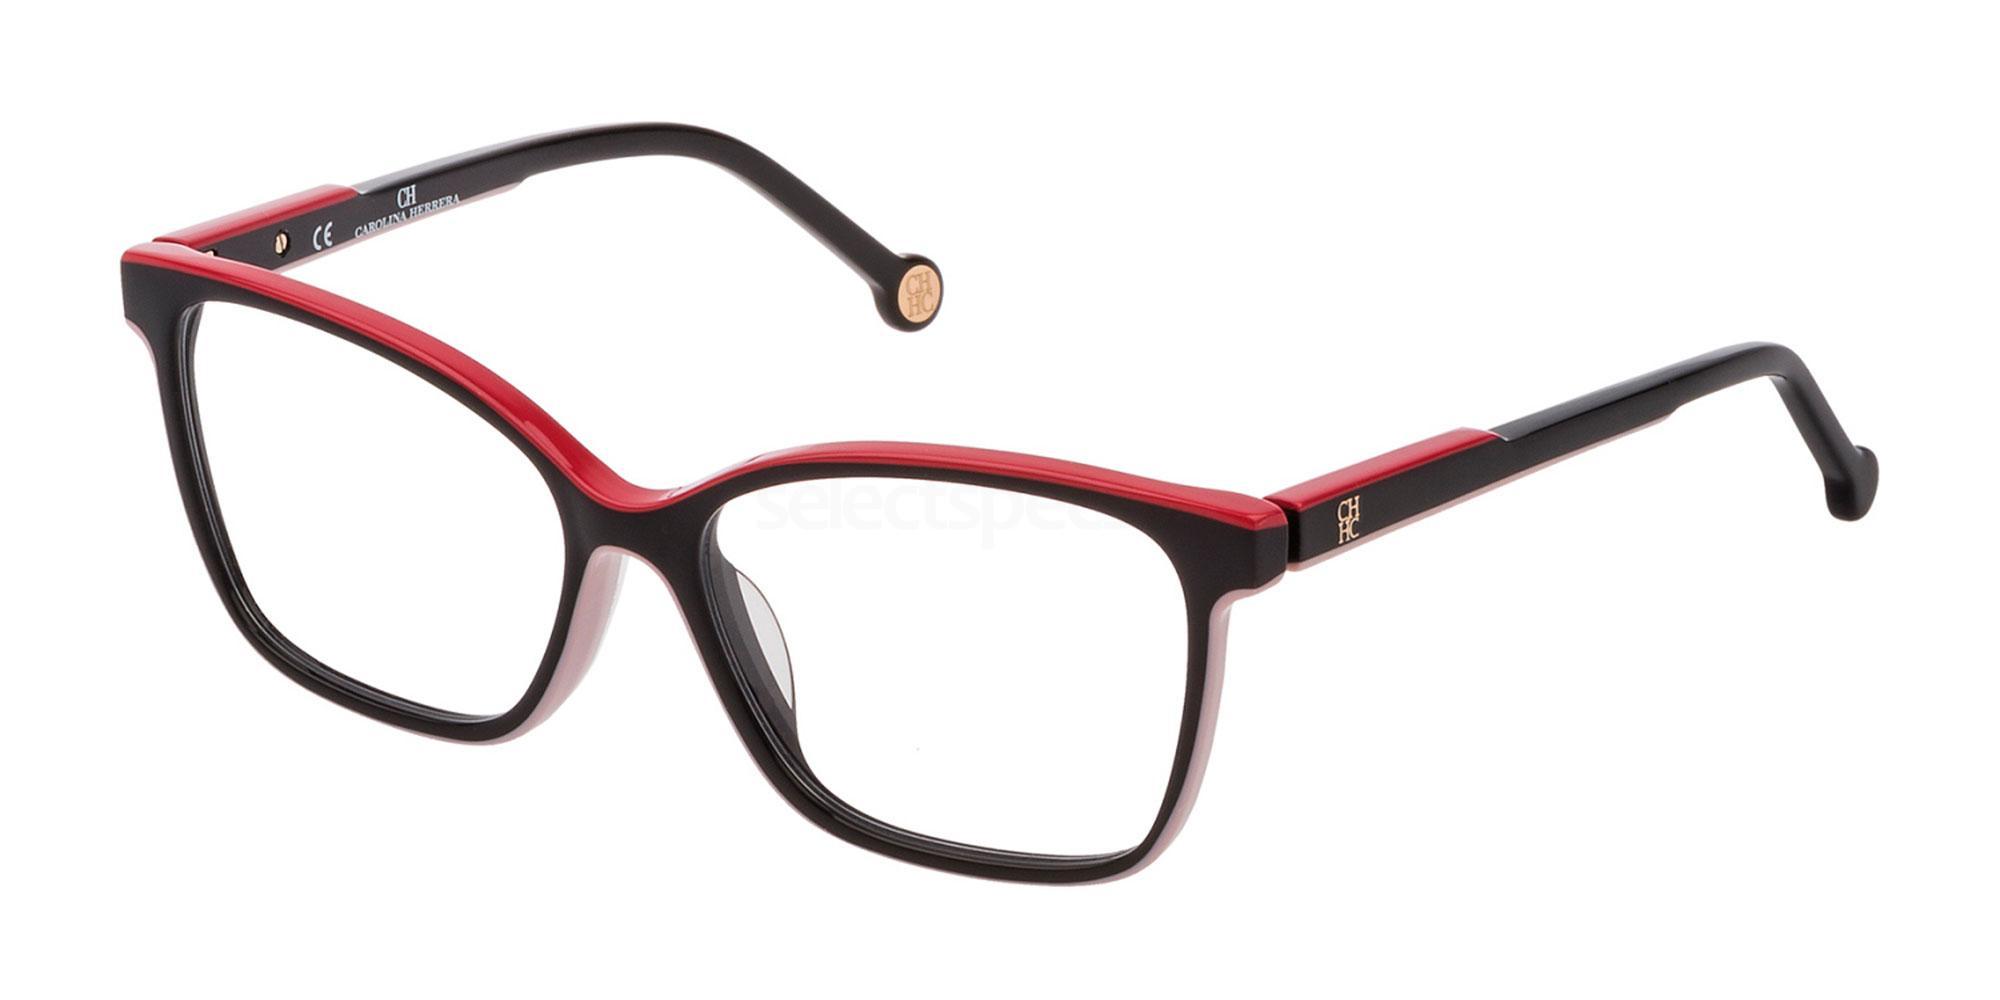 09P2 VHE801 Glasses, CH Carolina Herrera